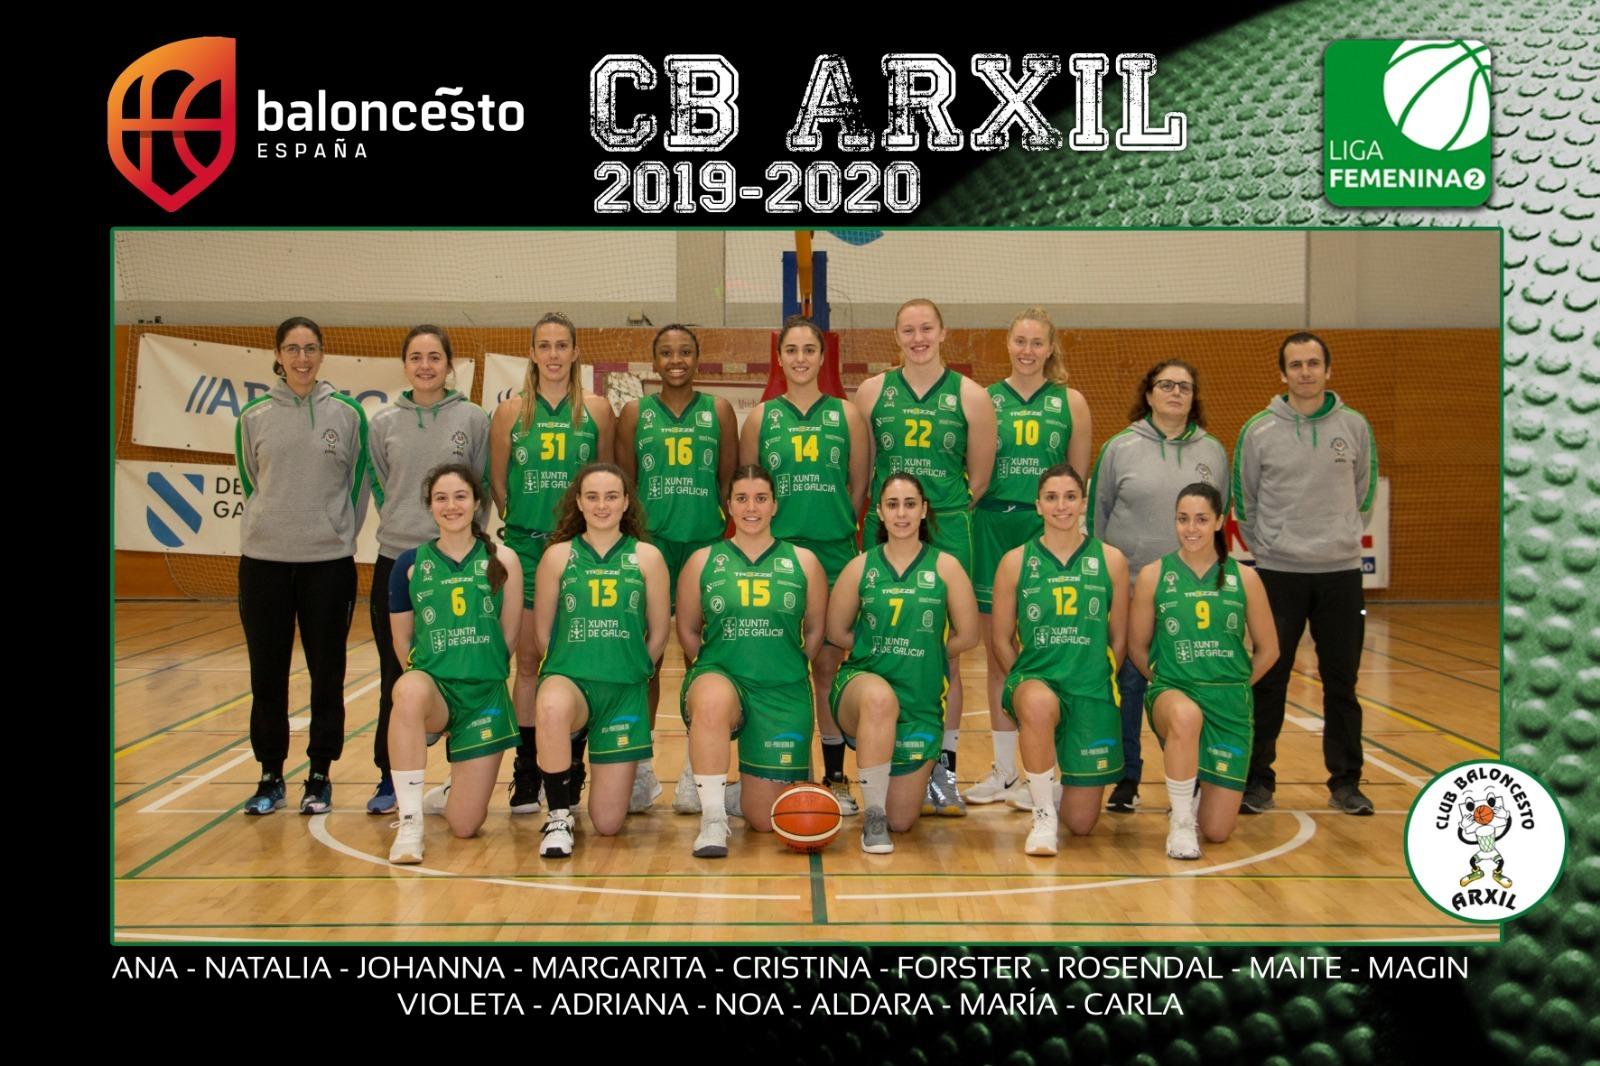 Plantel CB Arxil 2019-2020 - CB Arxil